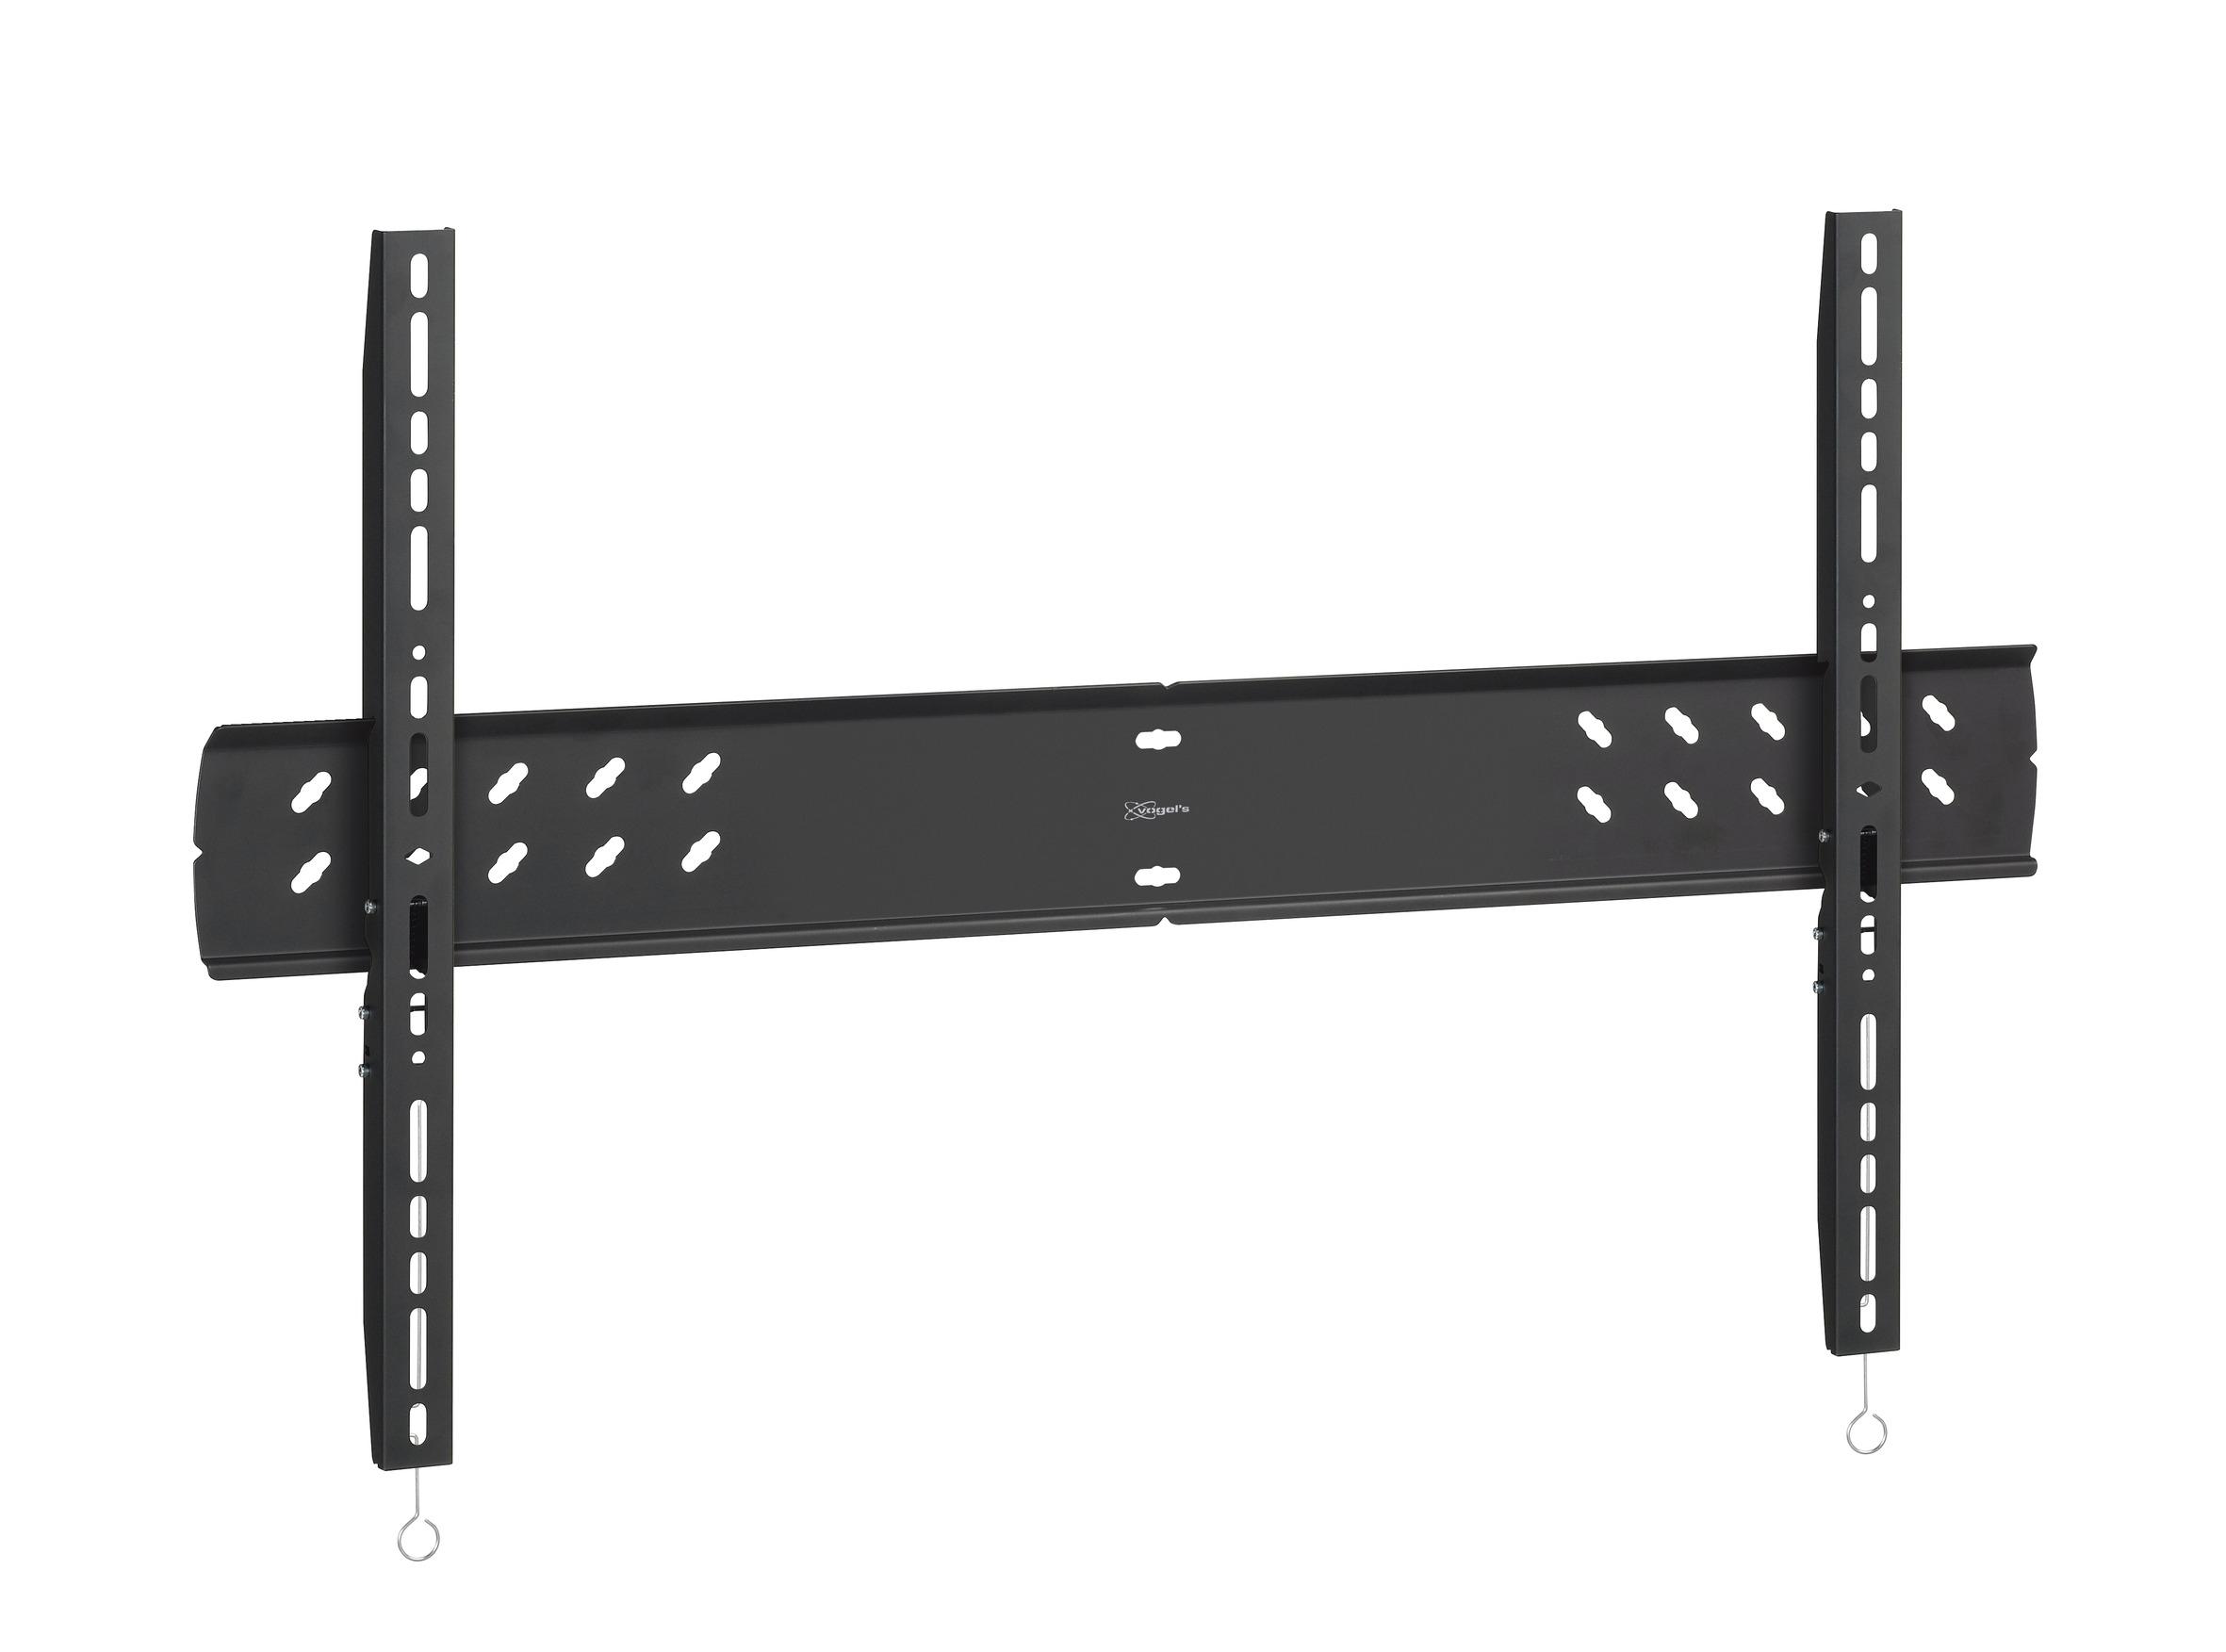 Vogel's PFW 5000 Super flat wall mount